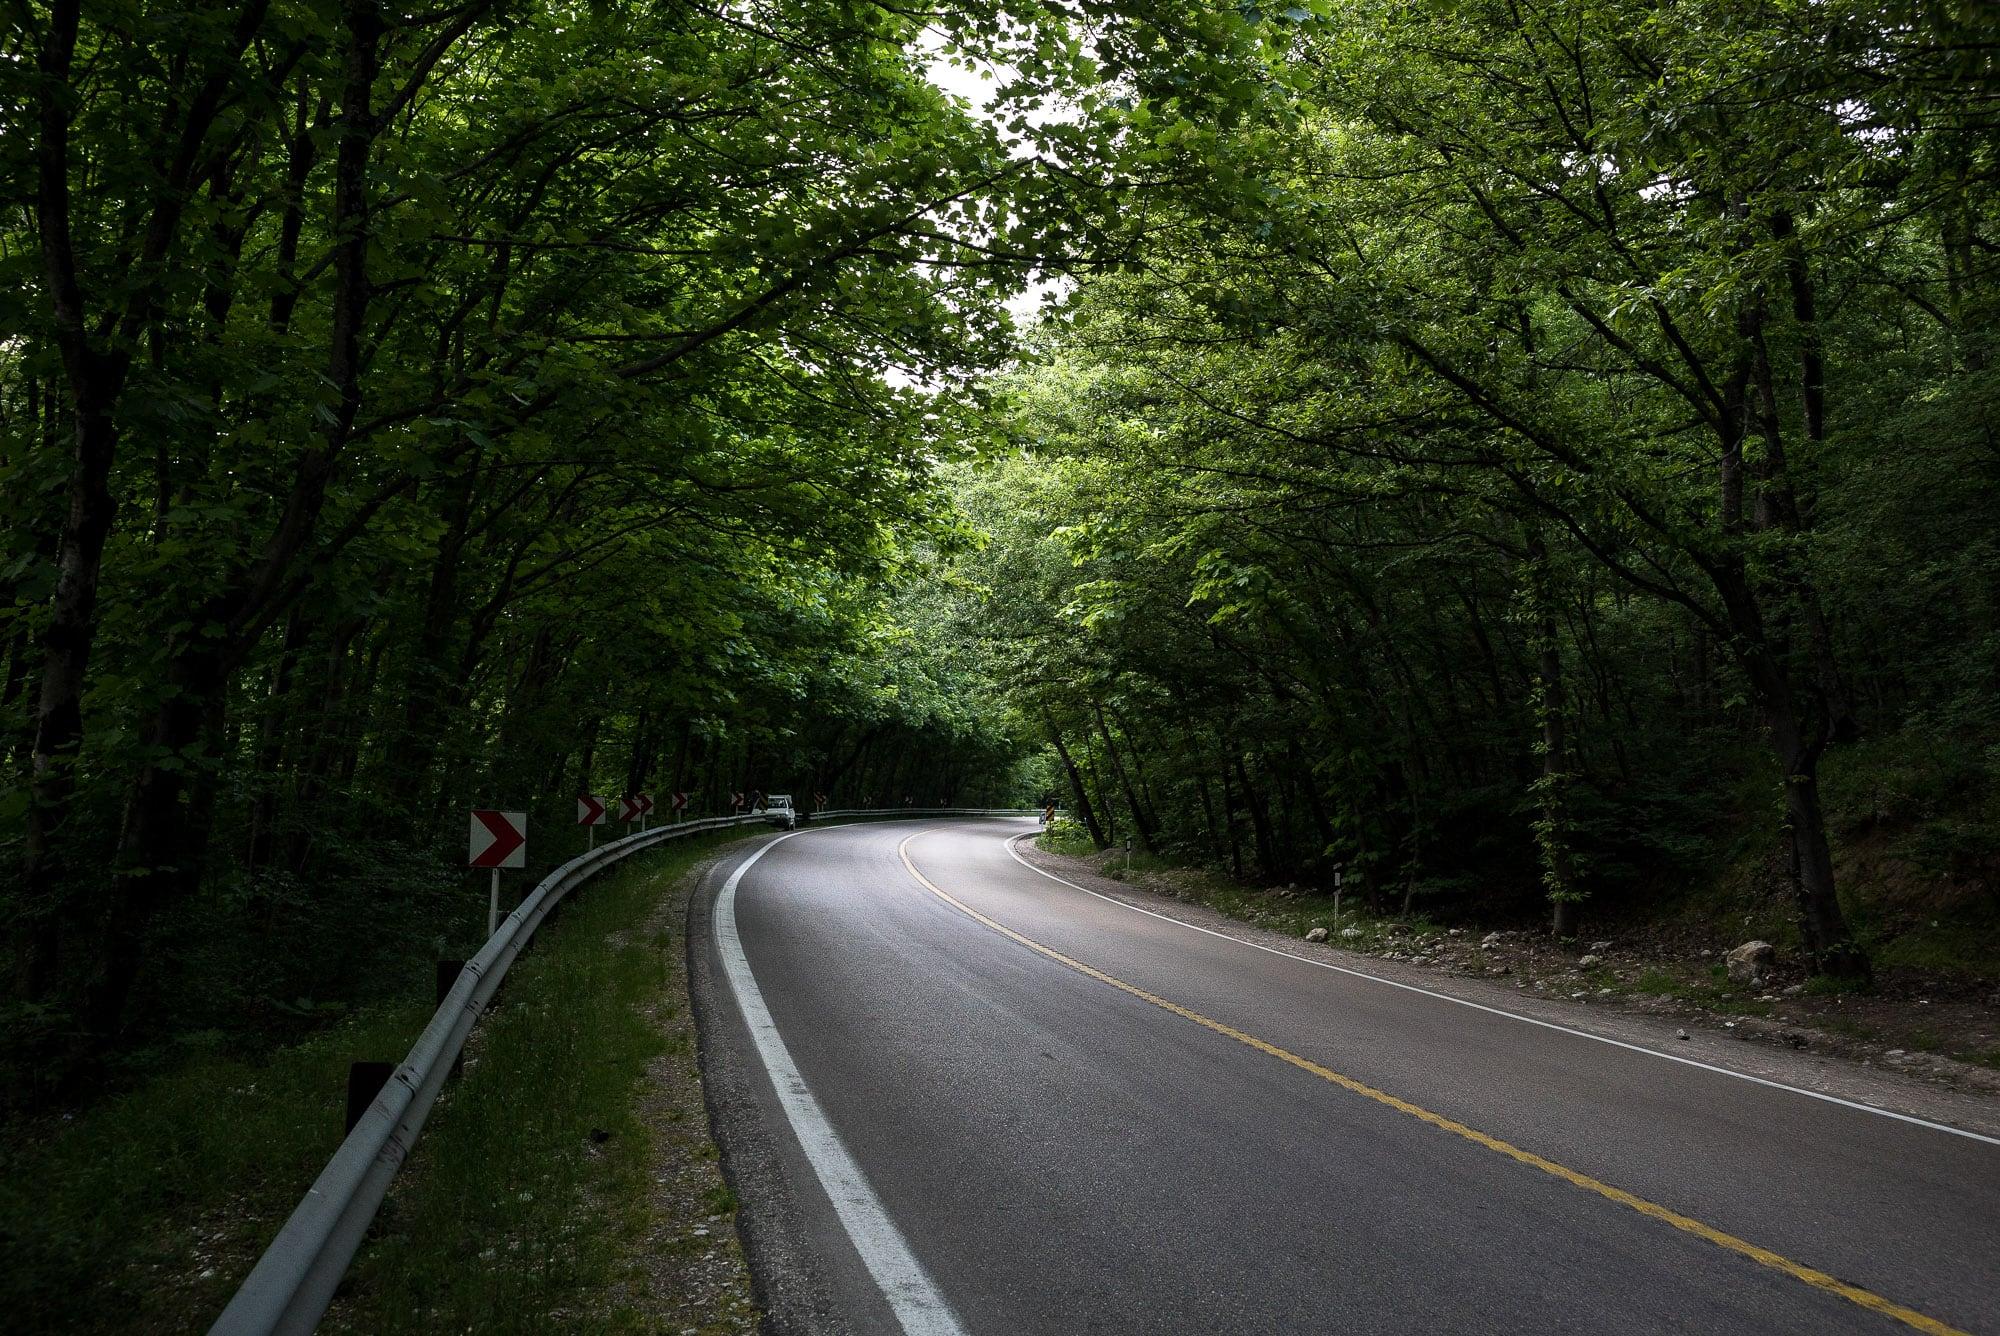 idyllic road?